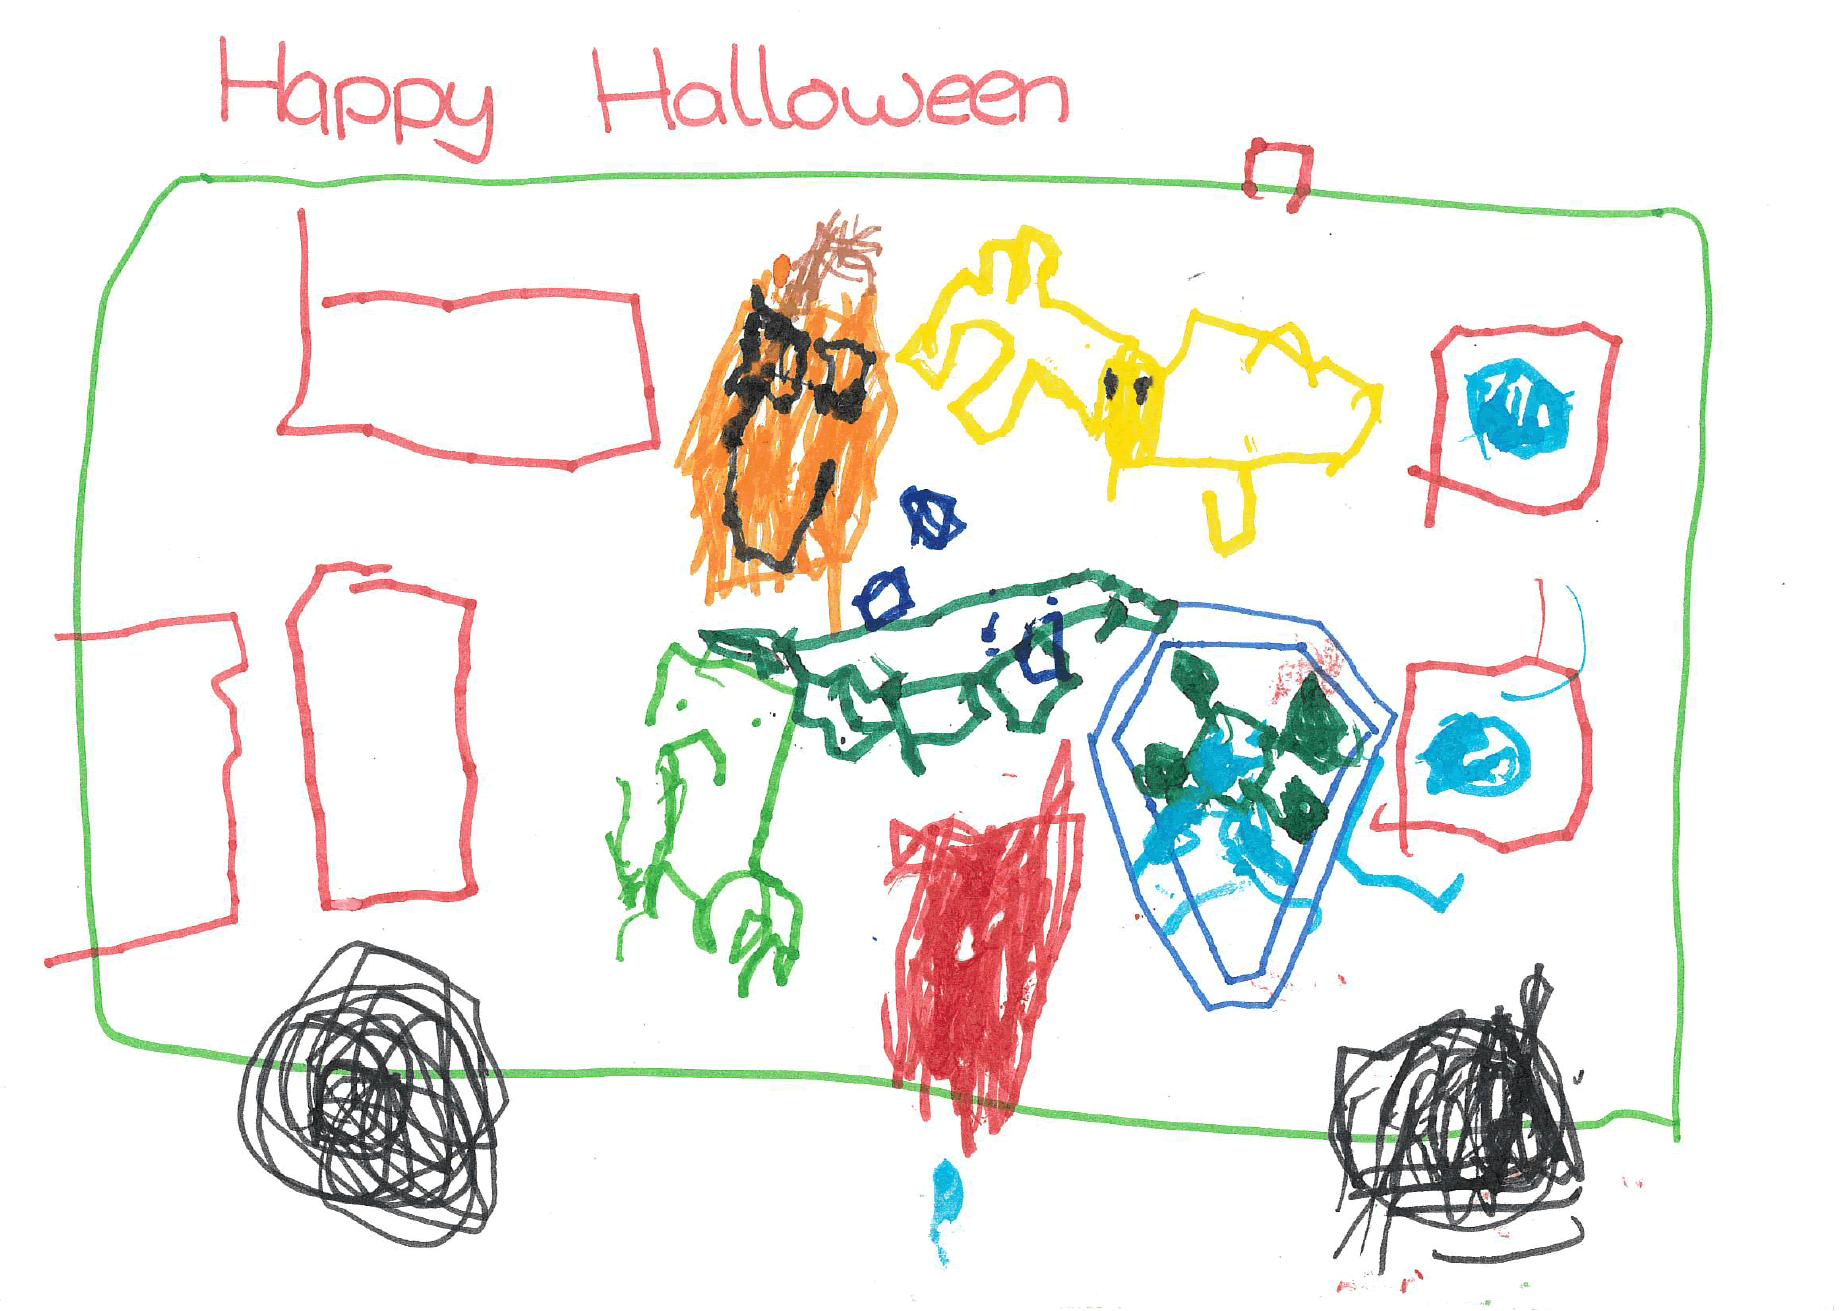 Halloween poster - Leon, age 10